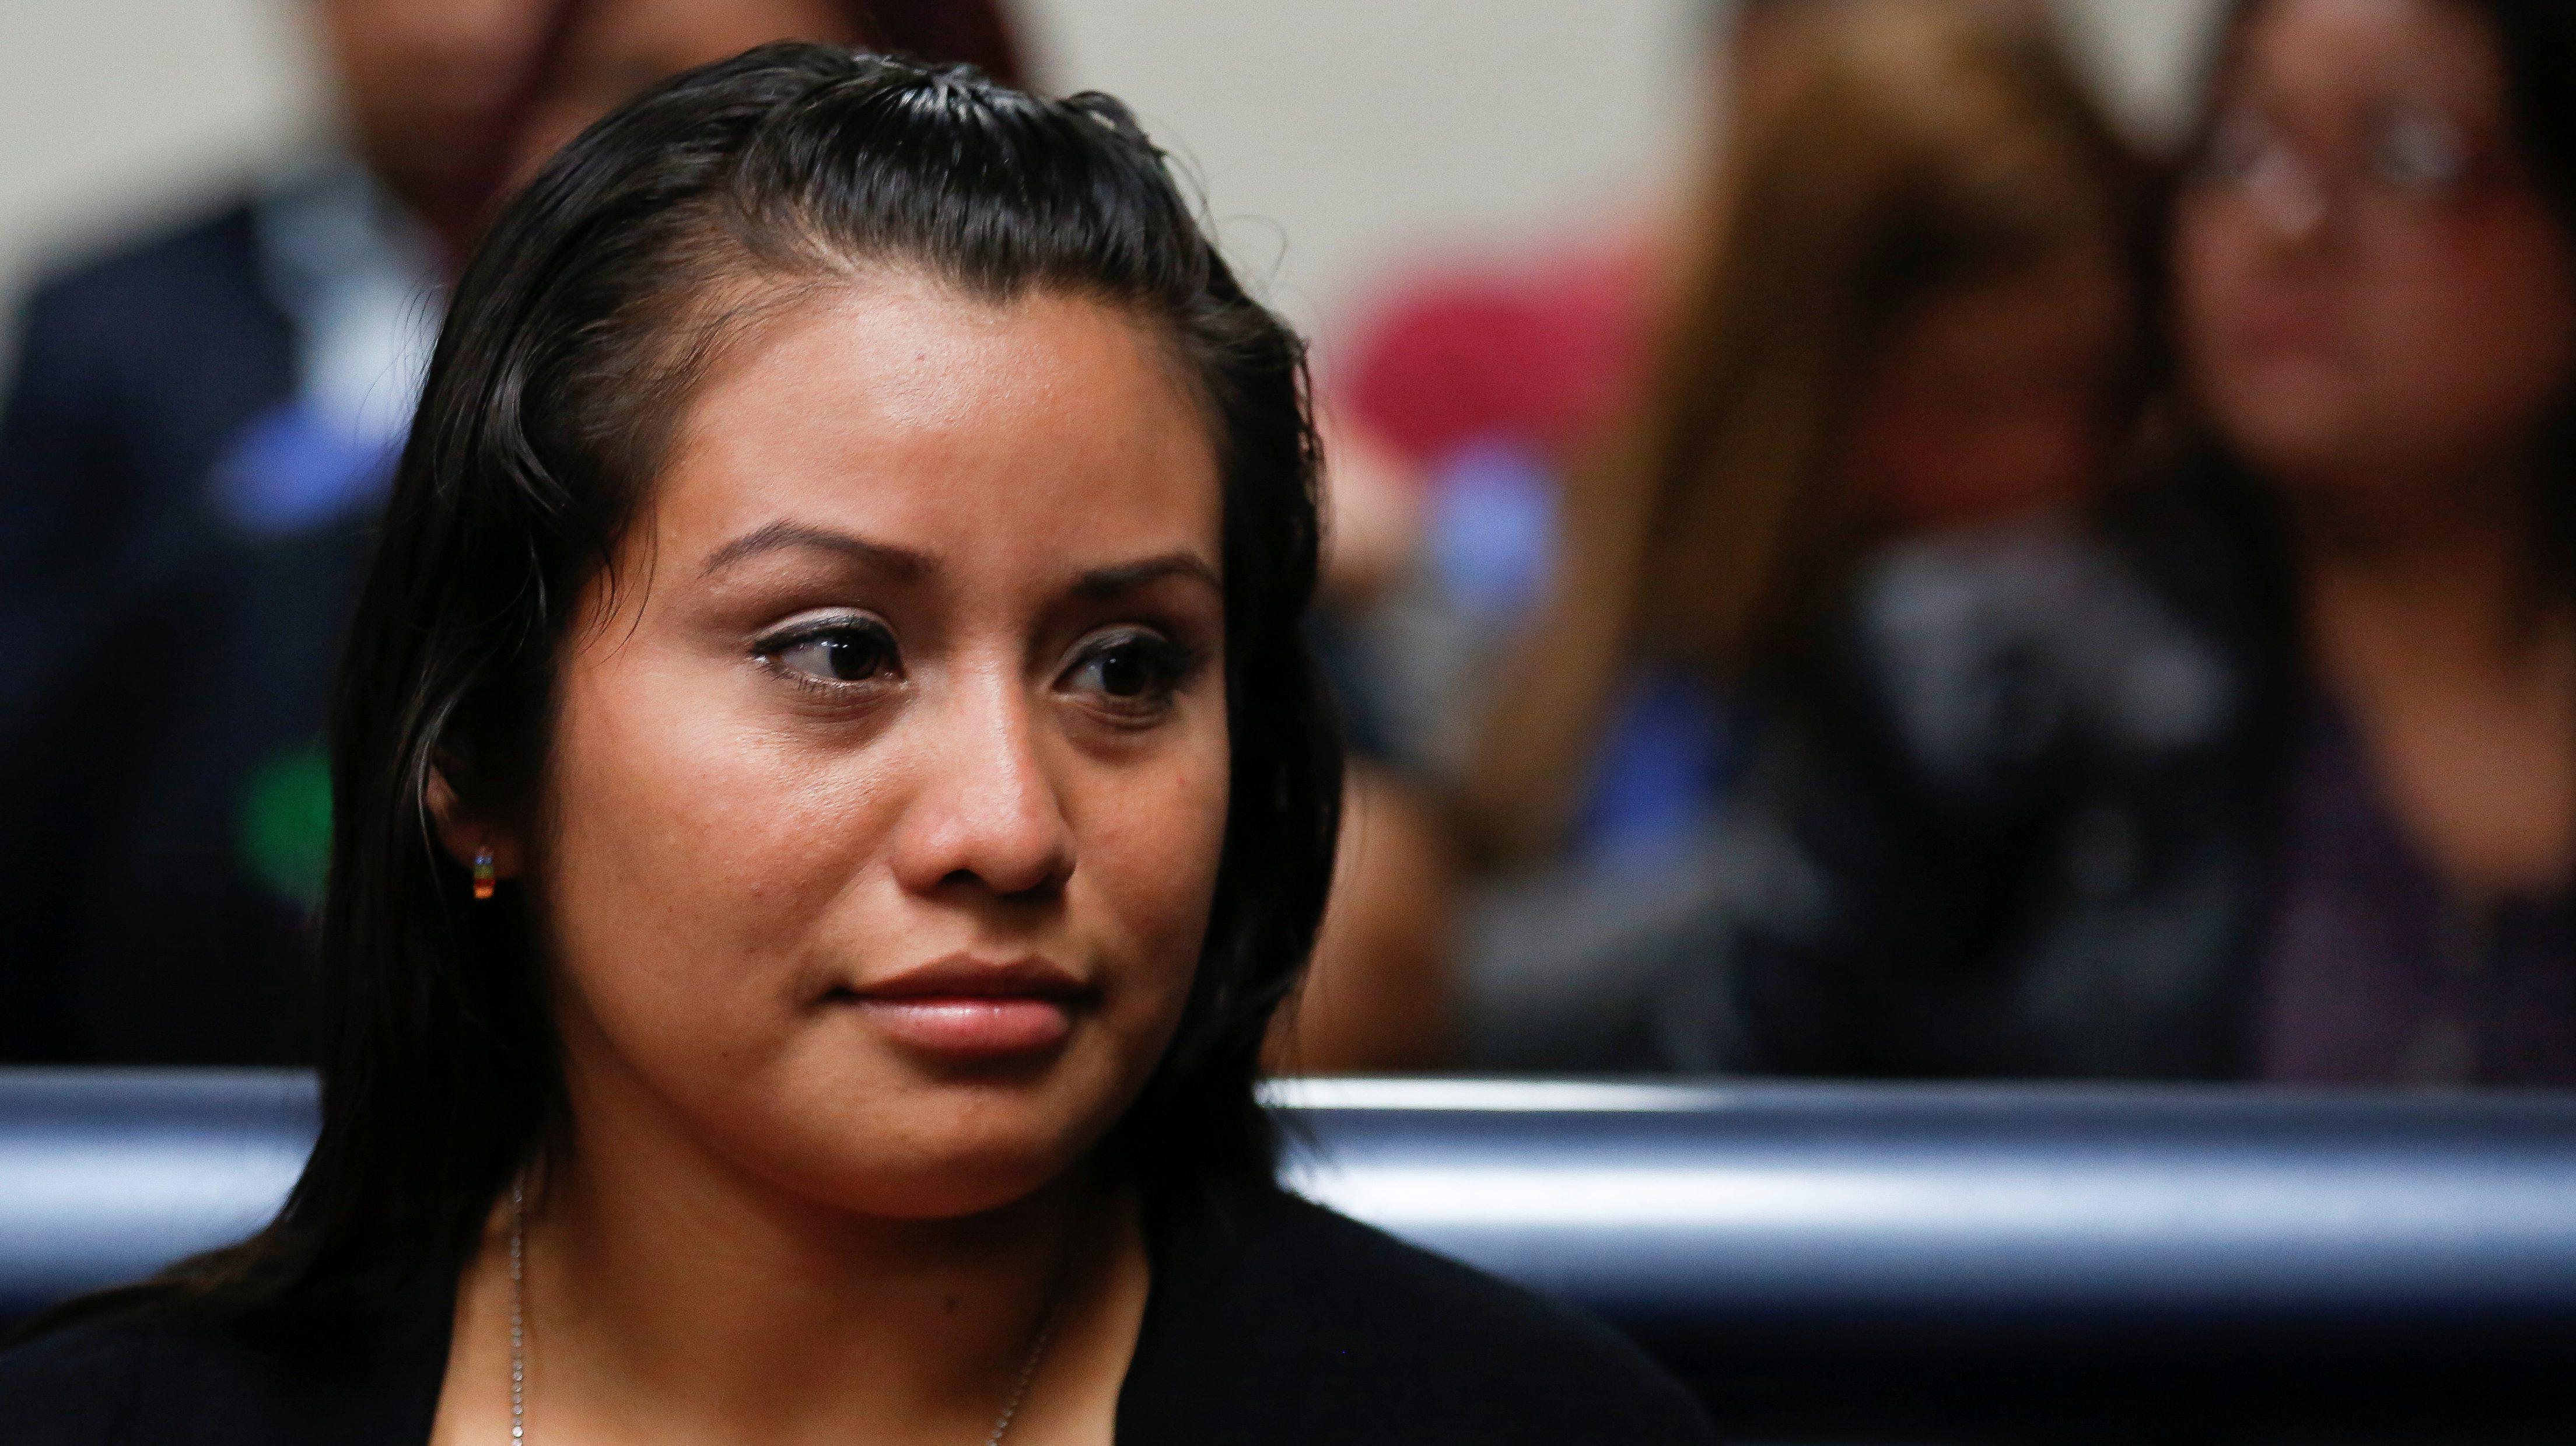 A woman accused of murder for having a stillbirth